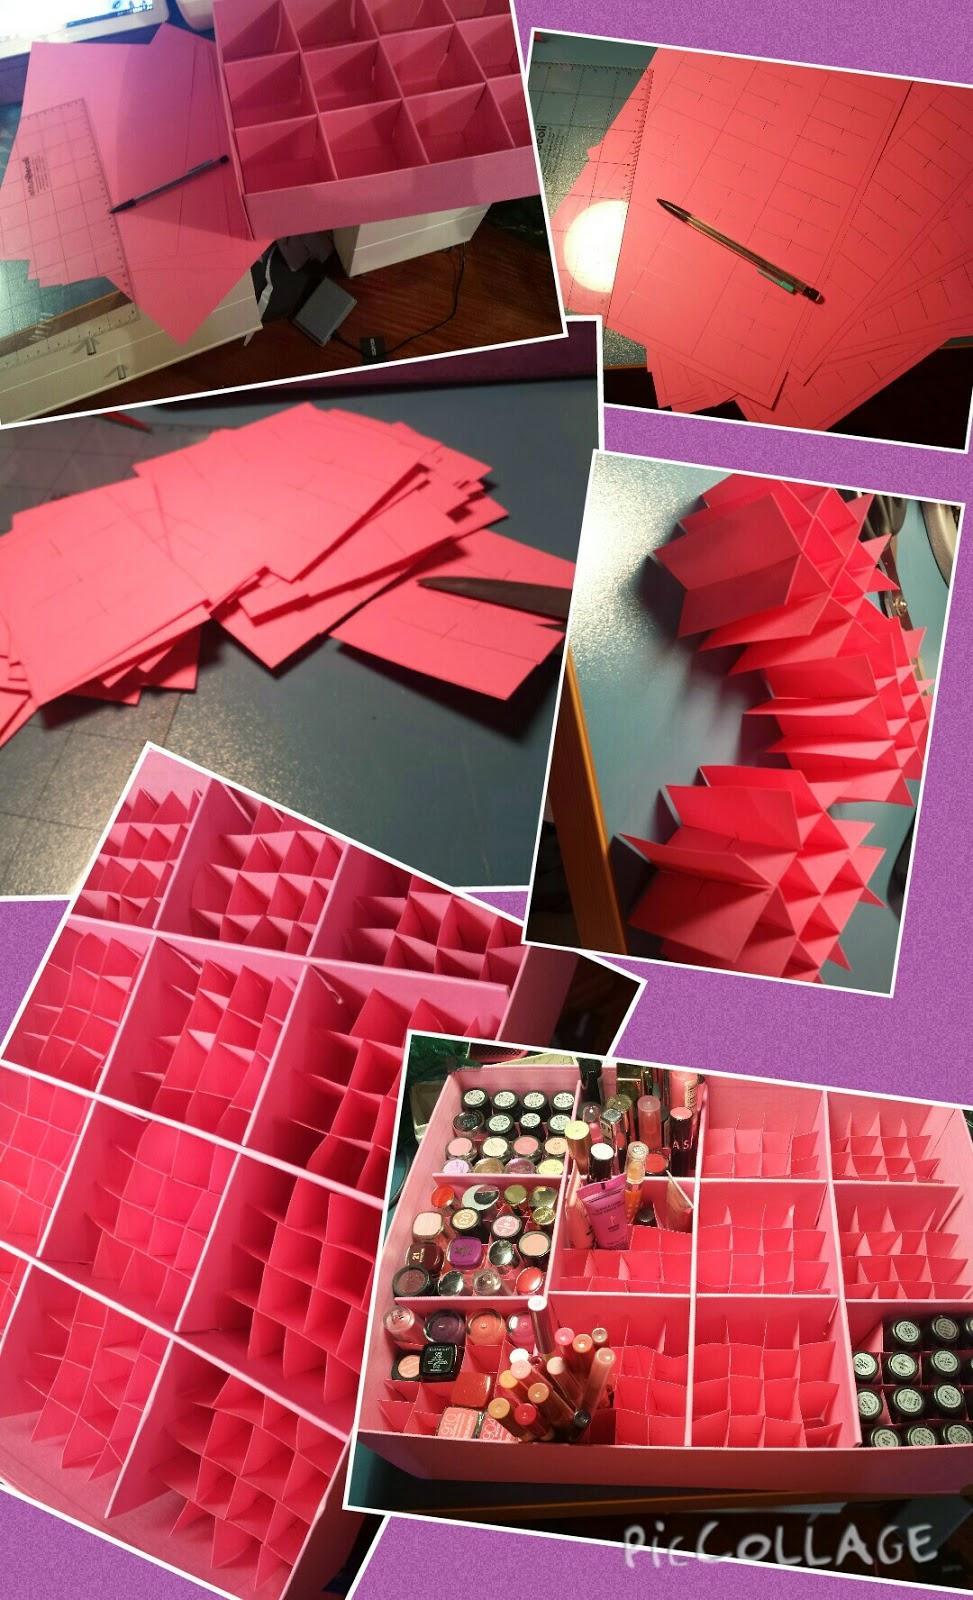 Piggy beauty porta rossetti fai da te for Porta capsule fai da te